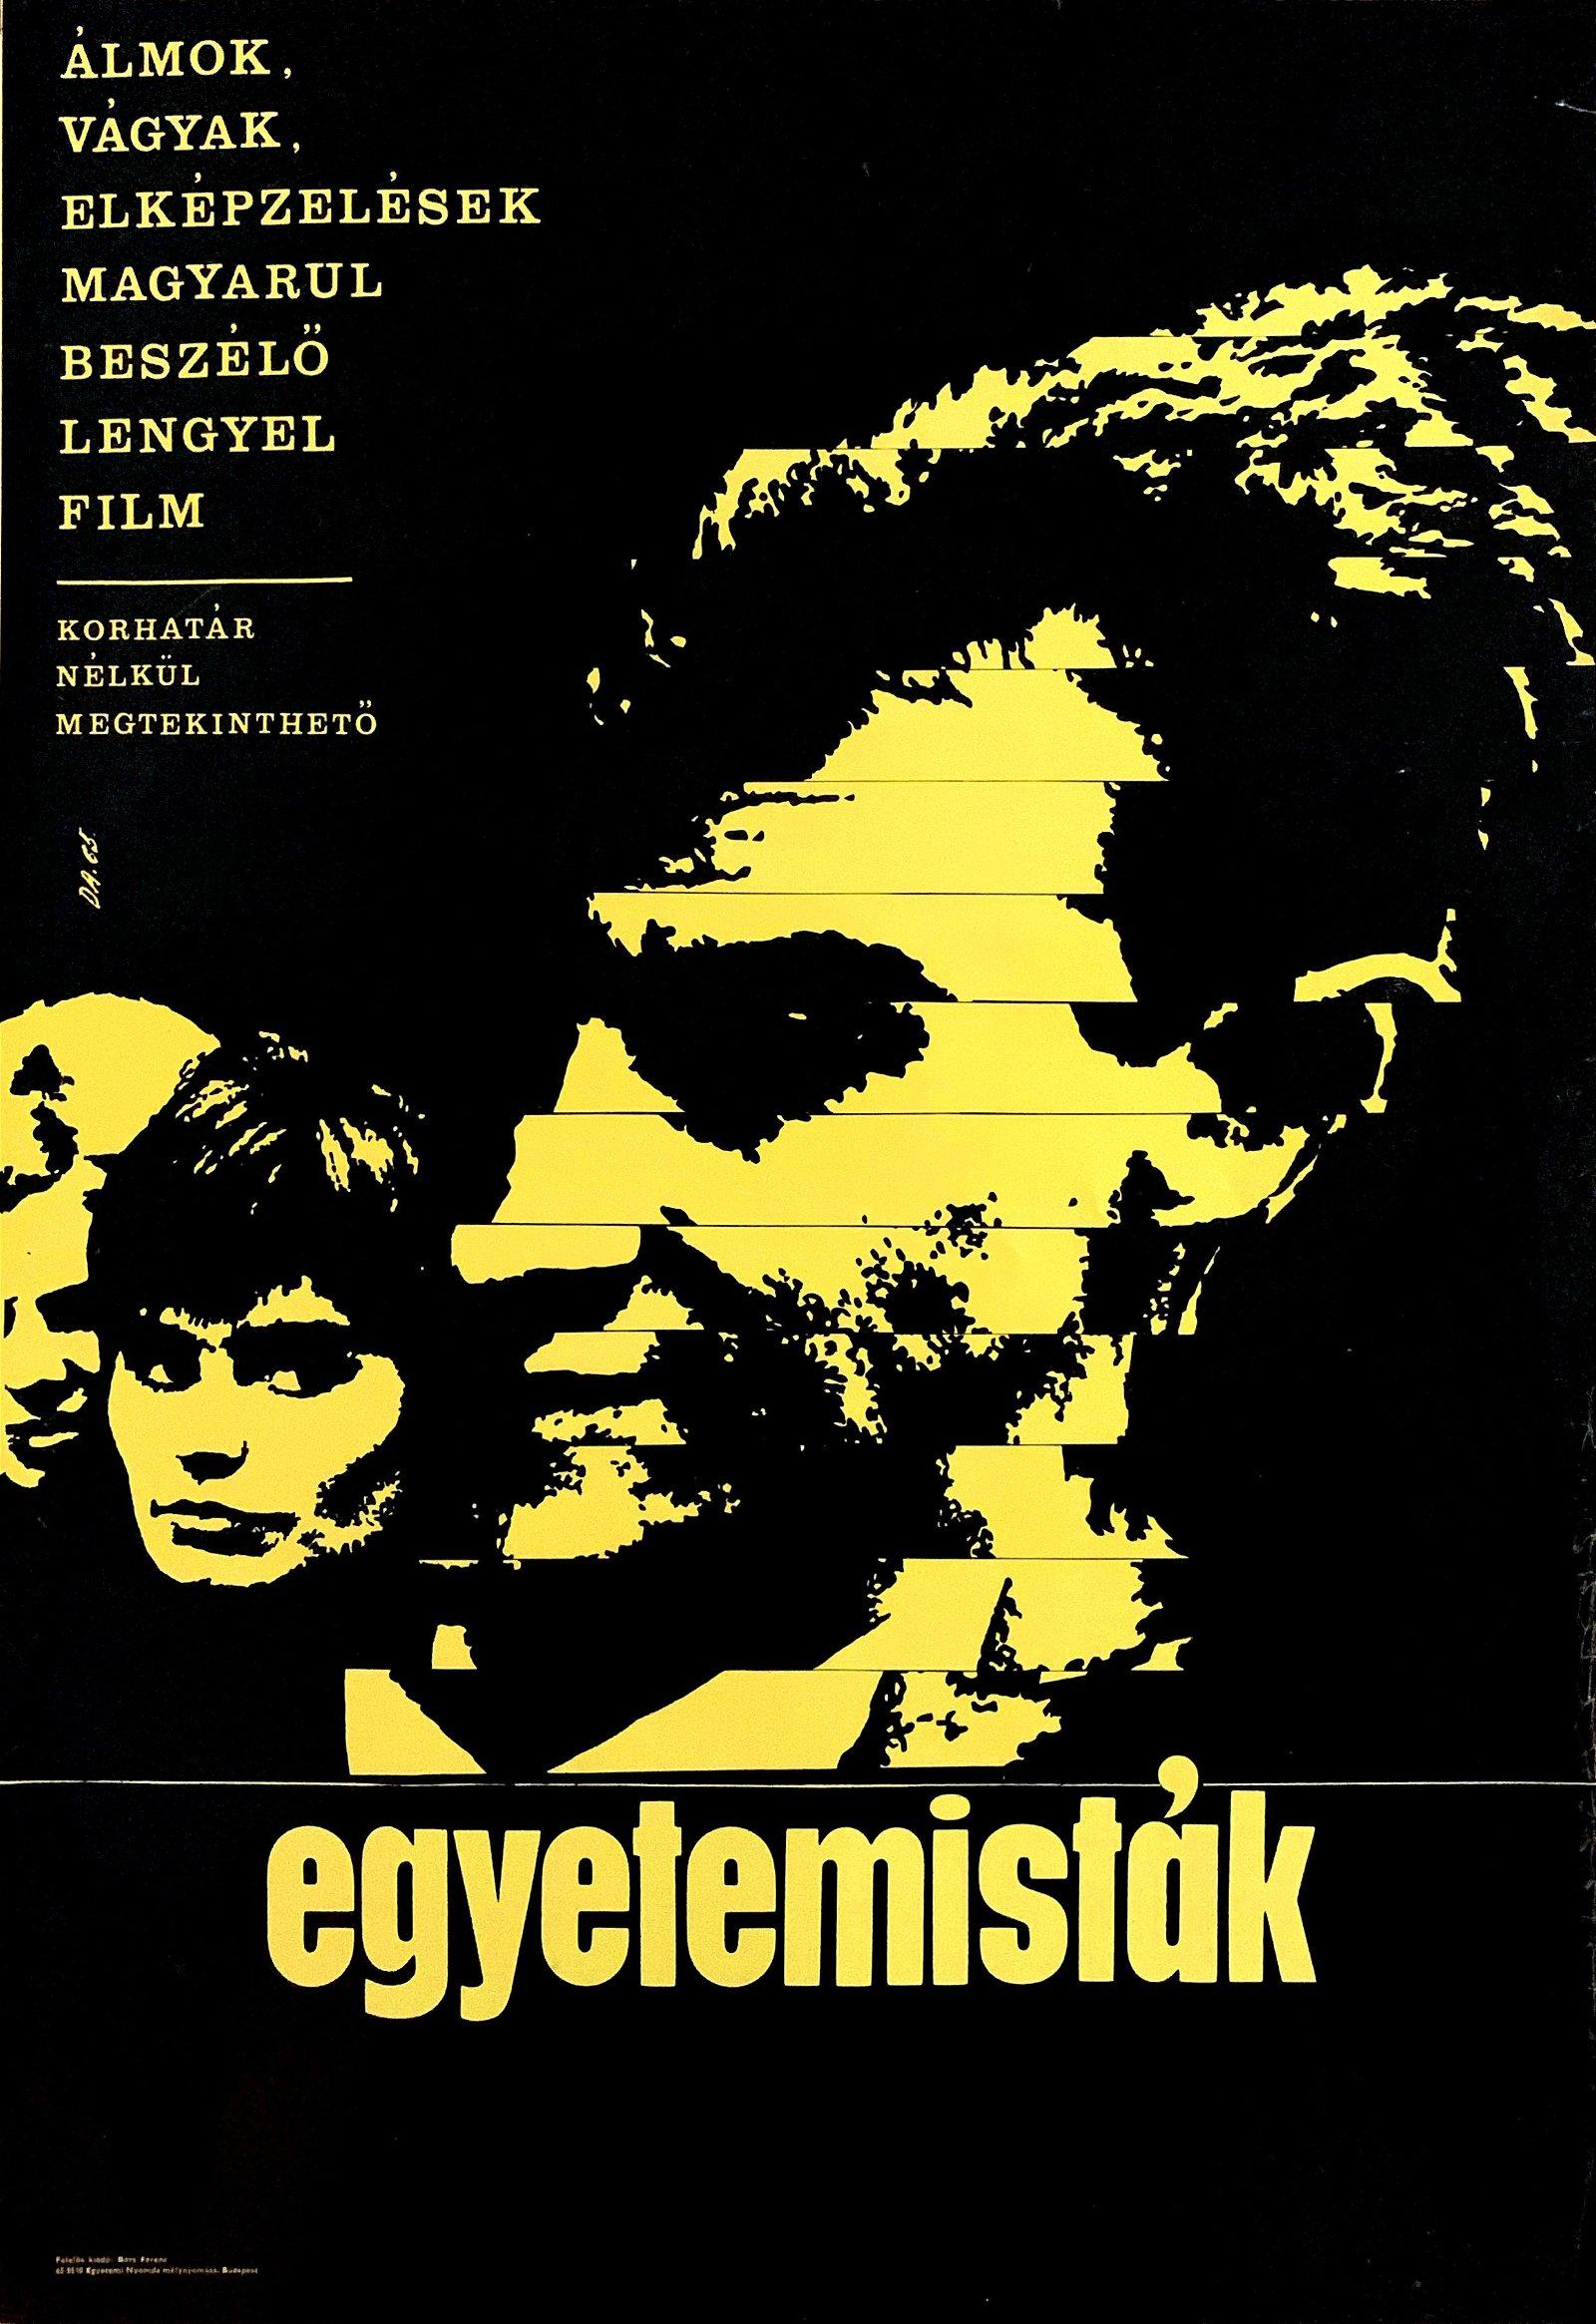 Movie Poster Penguin 1966